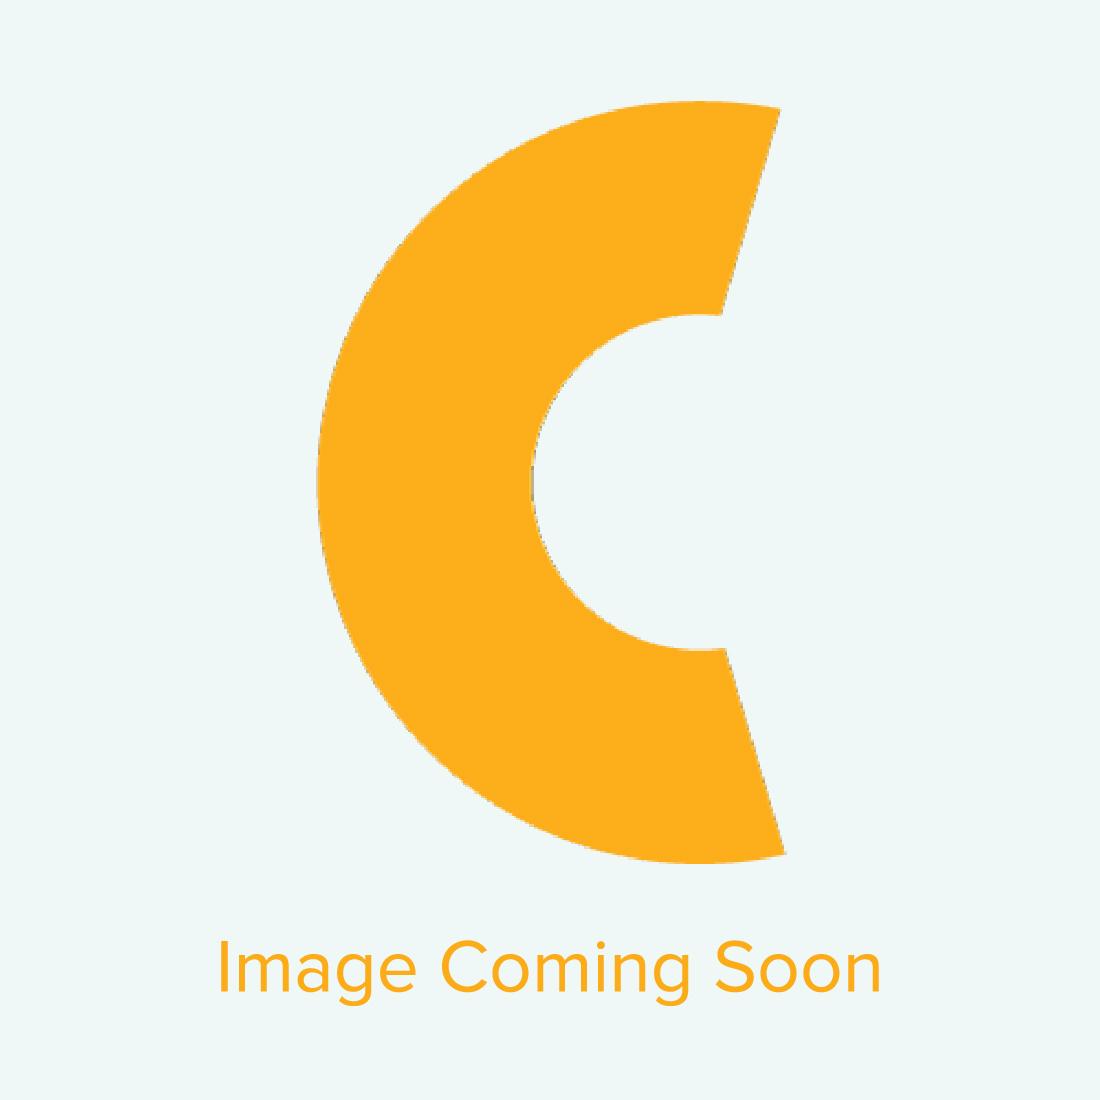 "Hotronix STX11 Auto Opening Digital Clamshell Heat Press Machine - 11"" x 15"""